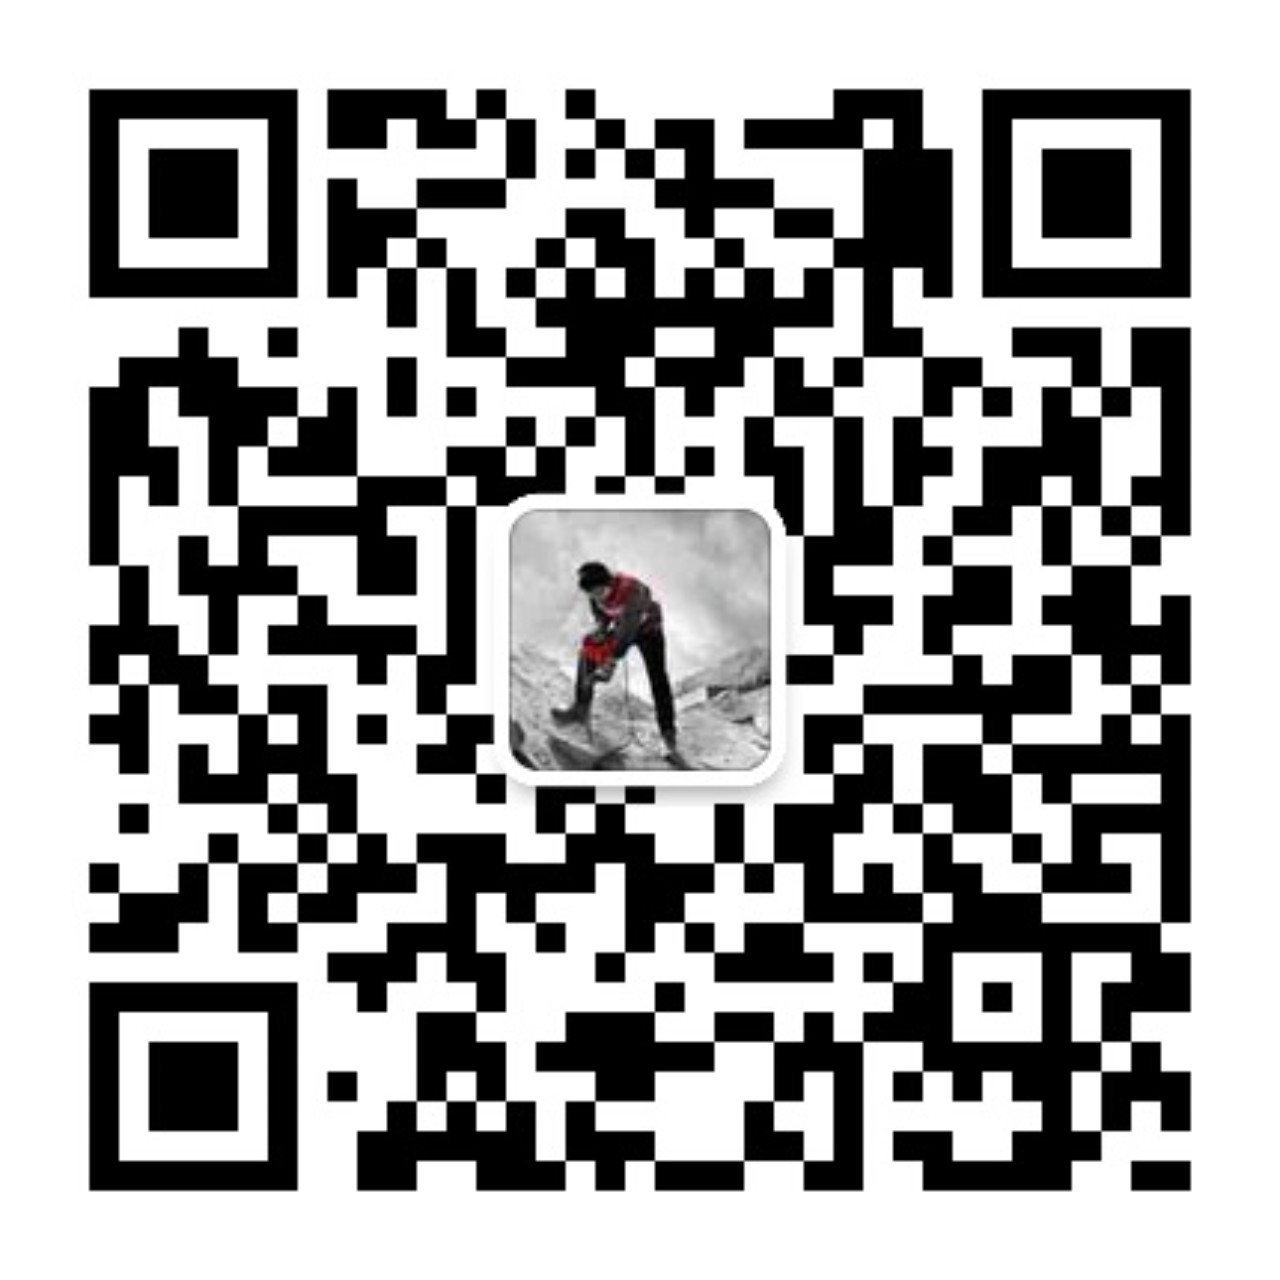 dd206c90-b528-41ca-a225-c666e4d40aa6